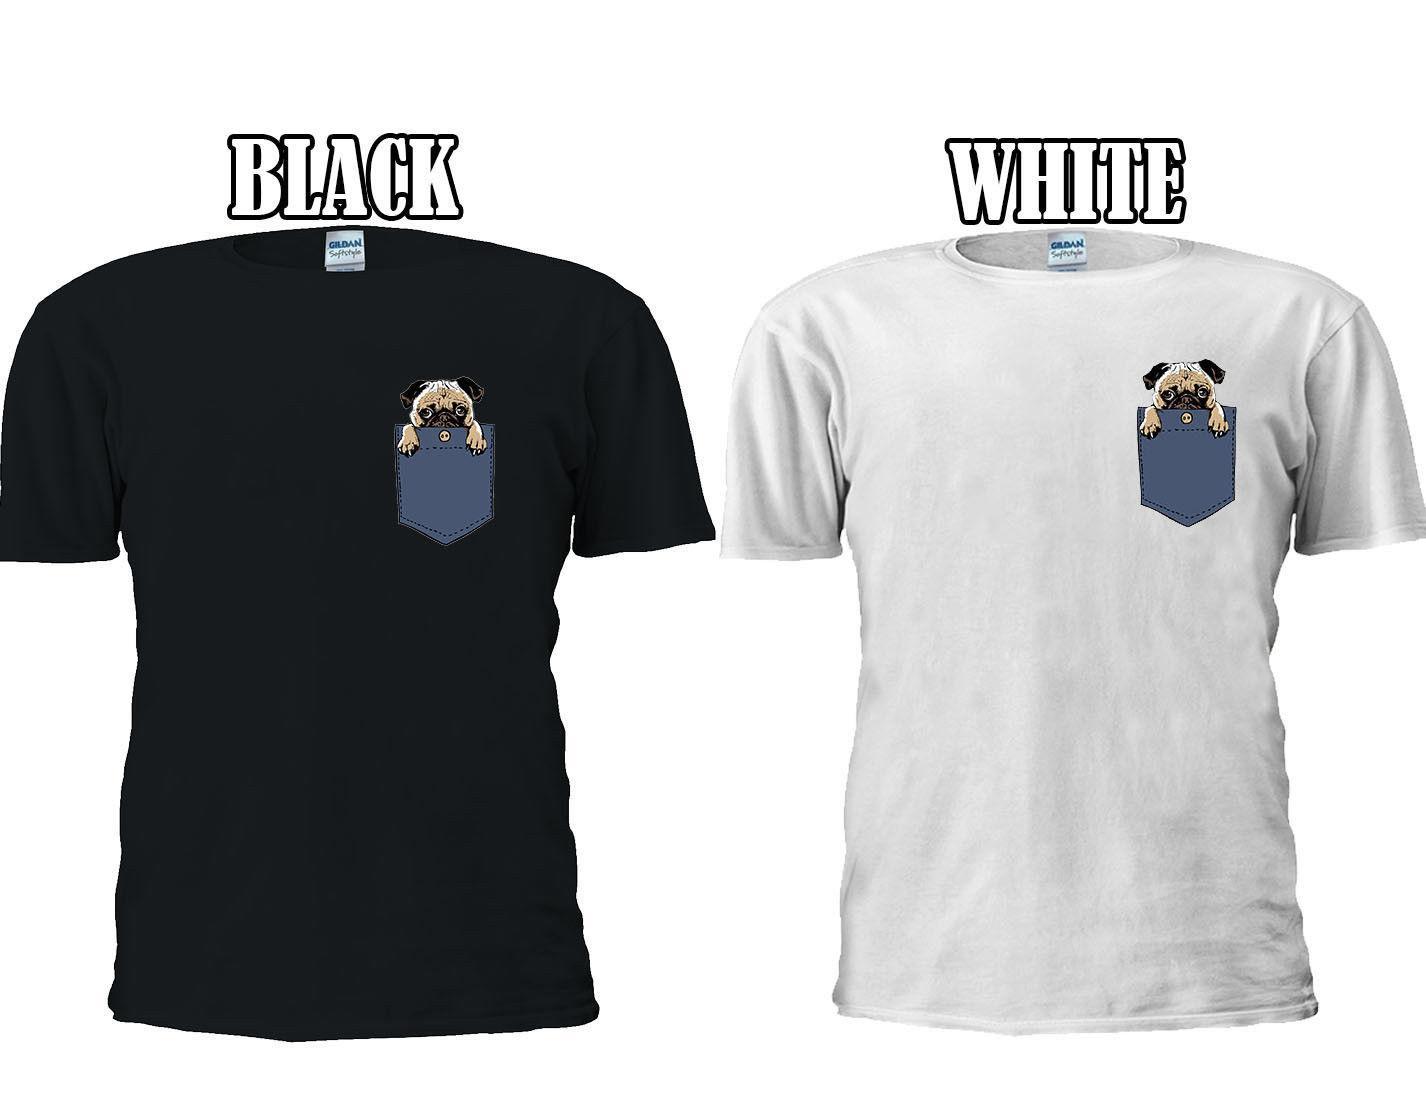 7cf2d15f4946 PUG In My Pocket Dog Funny Cute T Shirt Baseball Vest Men Women Unisex 2697  Top T Shirt T Shirts Online Shopping Buy T Shirts From Qqq1510488977, ...